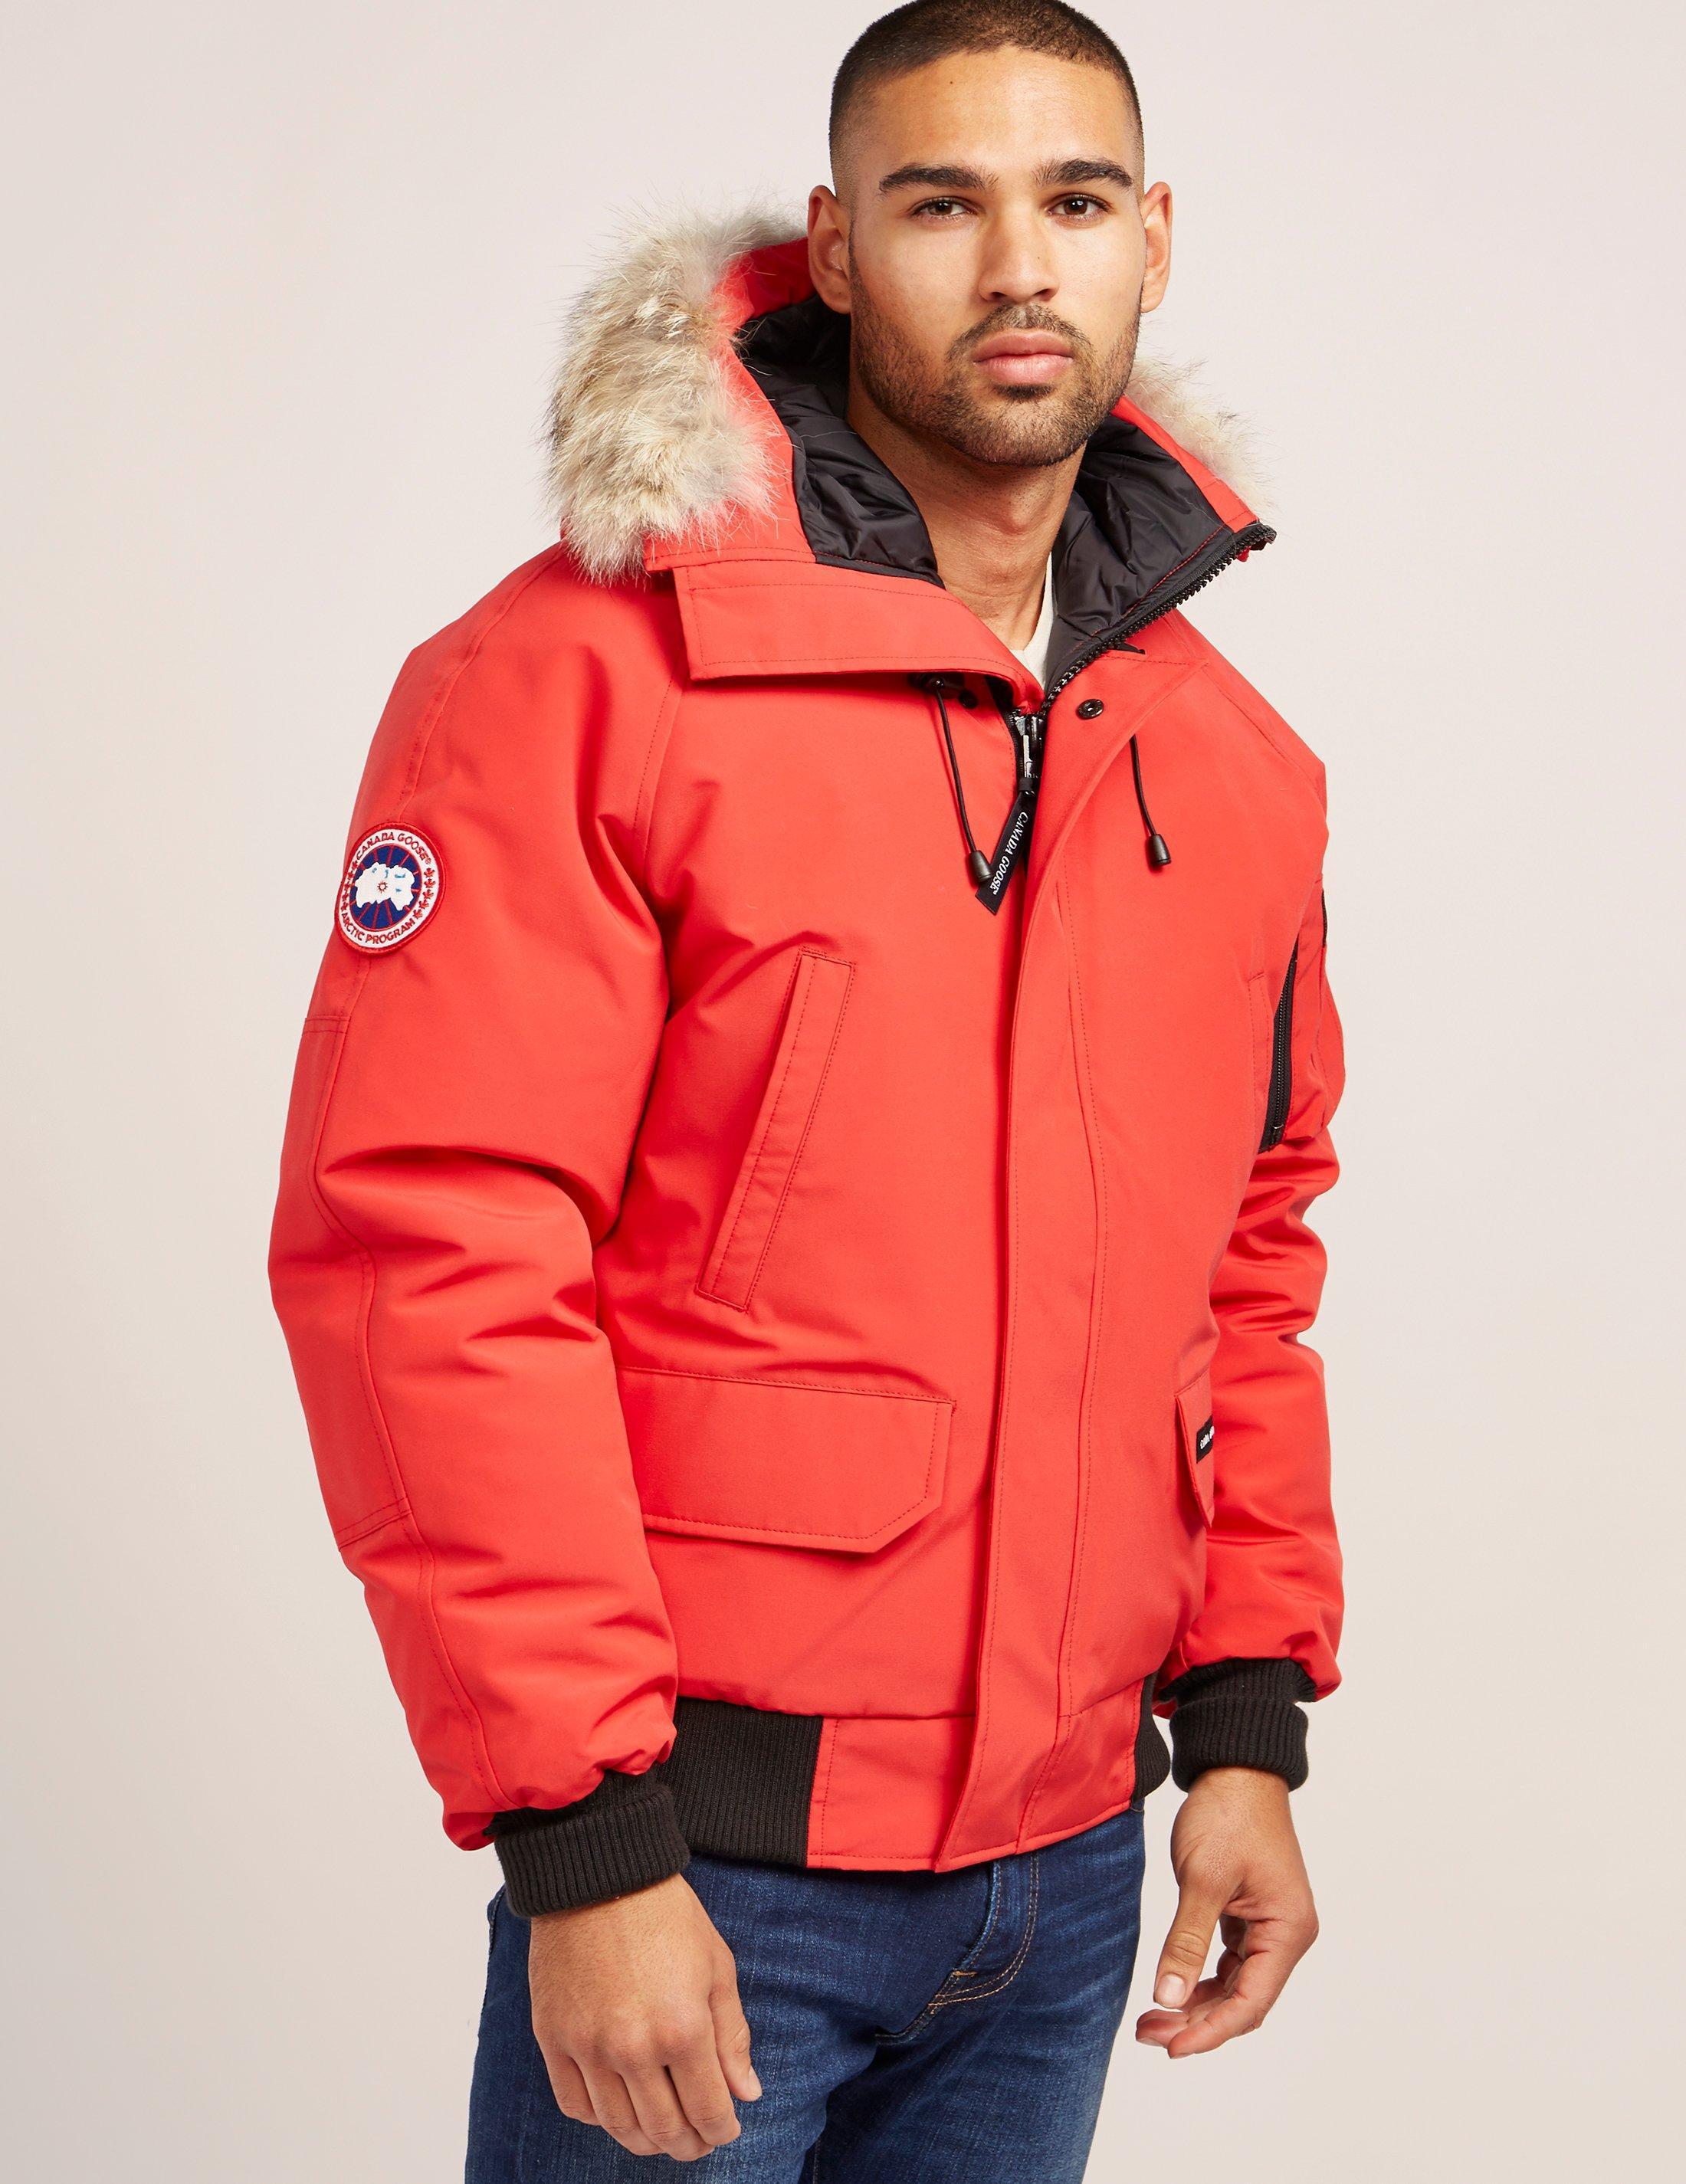 canada goose jacket mens macys